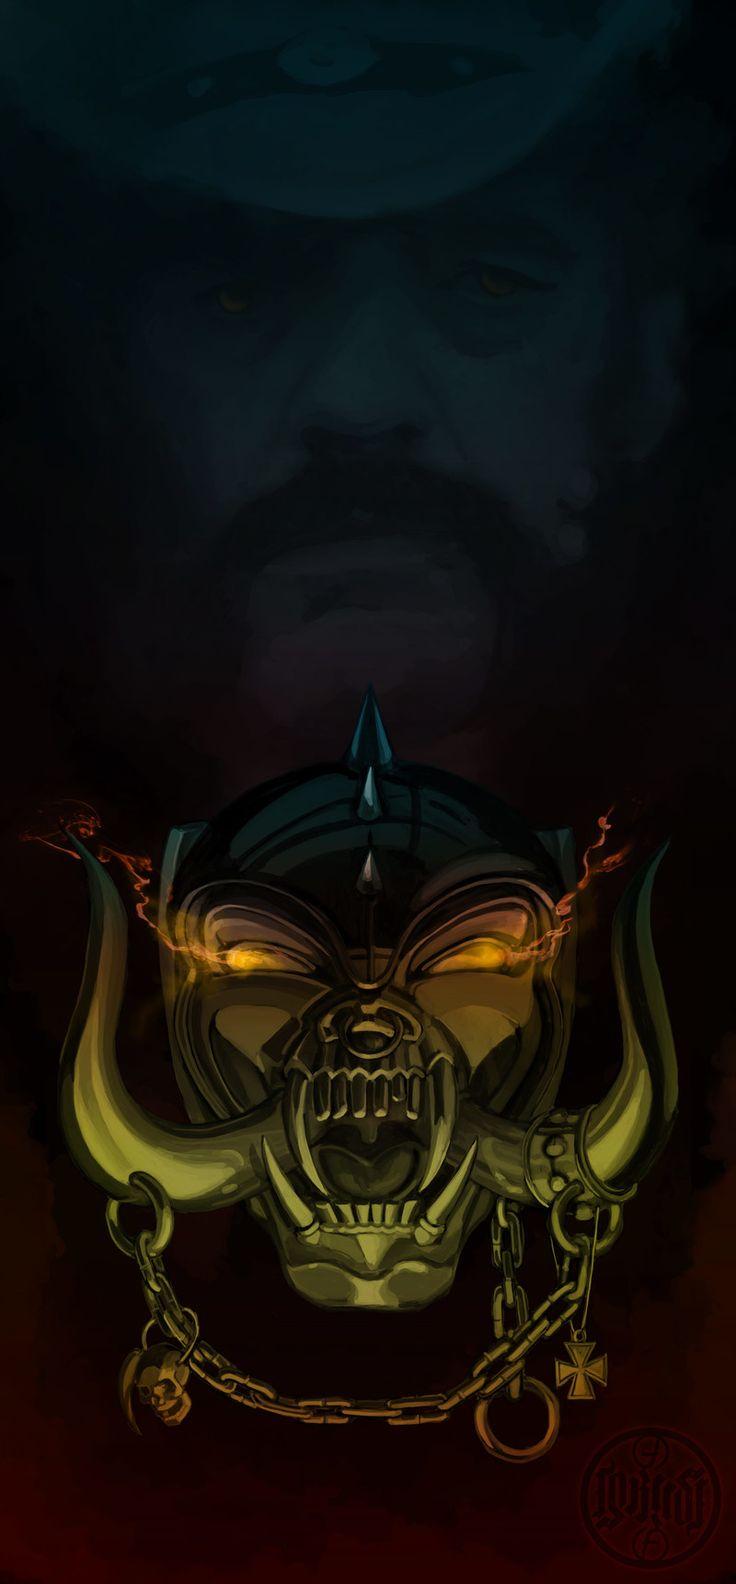 ArtStation - Editing Lemmy Kilmister - Motörhead